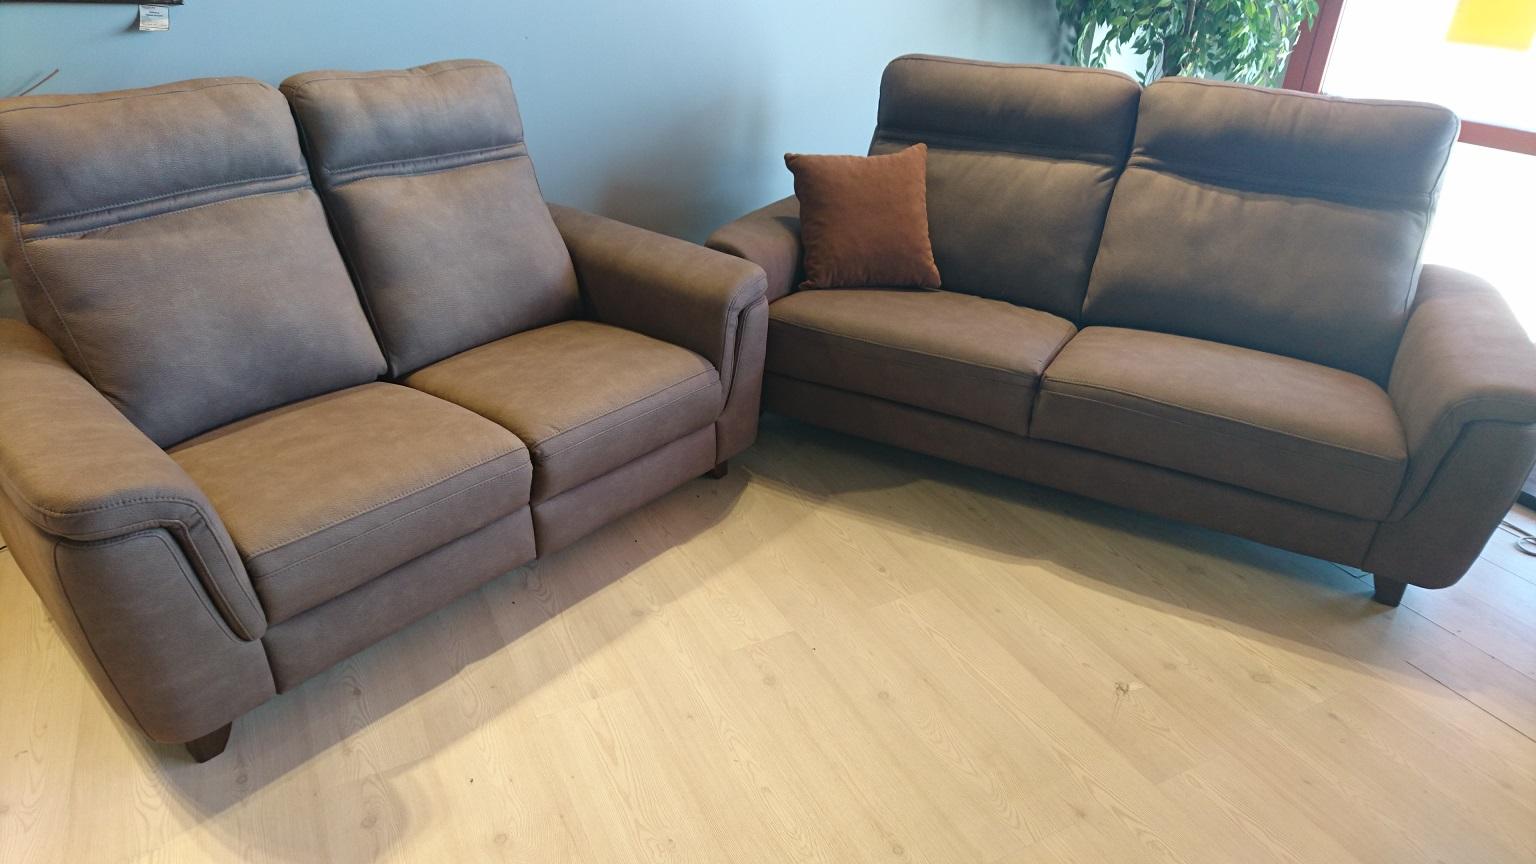 ELZA EMMOHL Warszawa Meble STUDIO KOMFORT sofa 2 z relaksem + sofa 3 tkanina DAKOTA 3 brąz zestaw sof